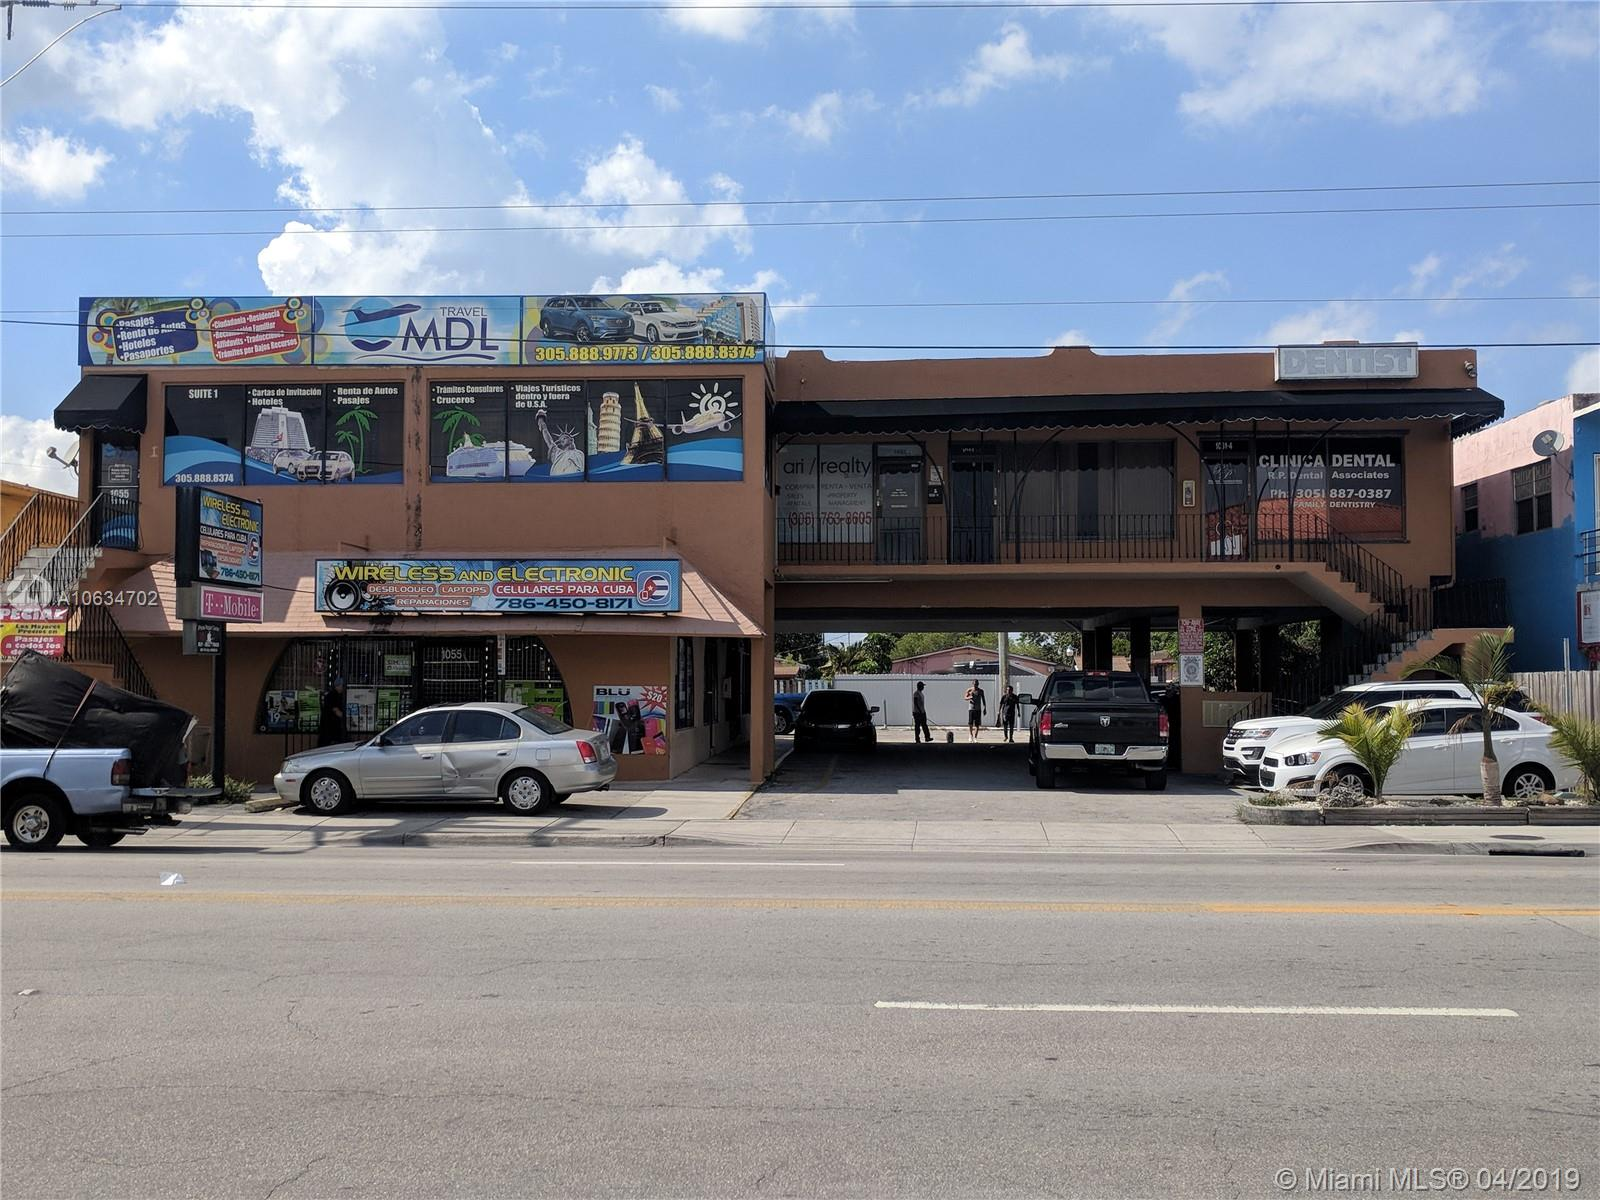 1051 W 29th St, Hialeah, FL 33012